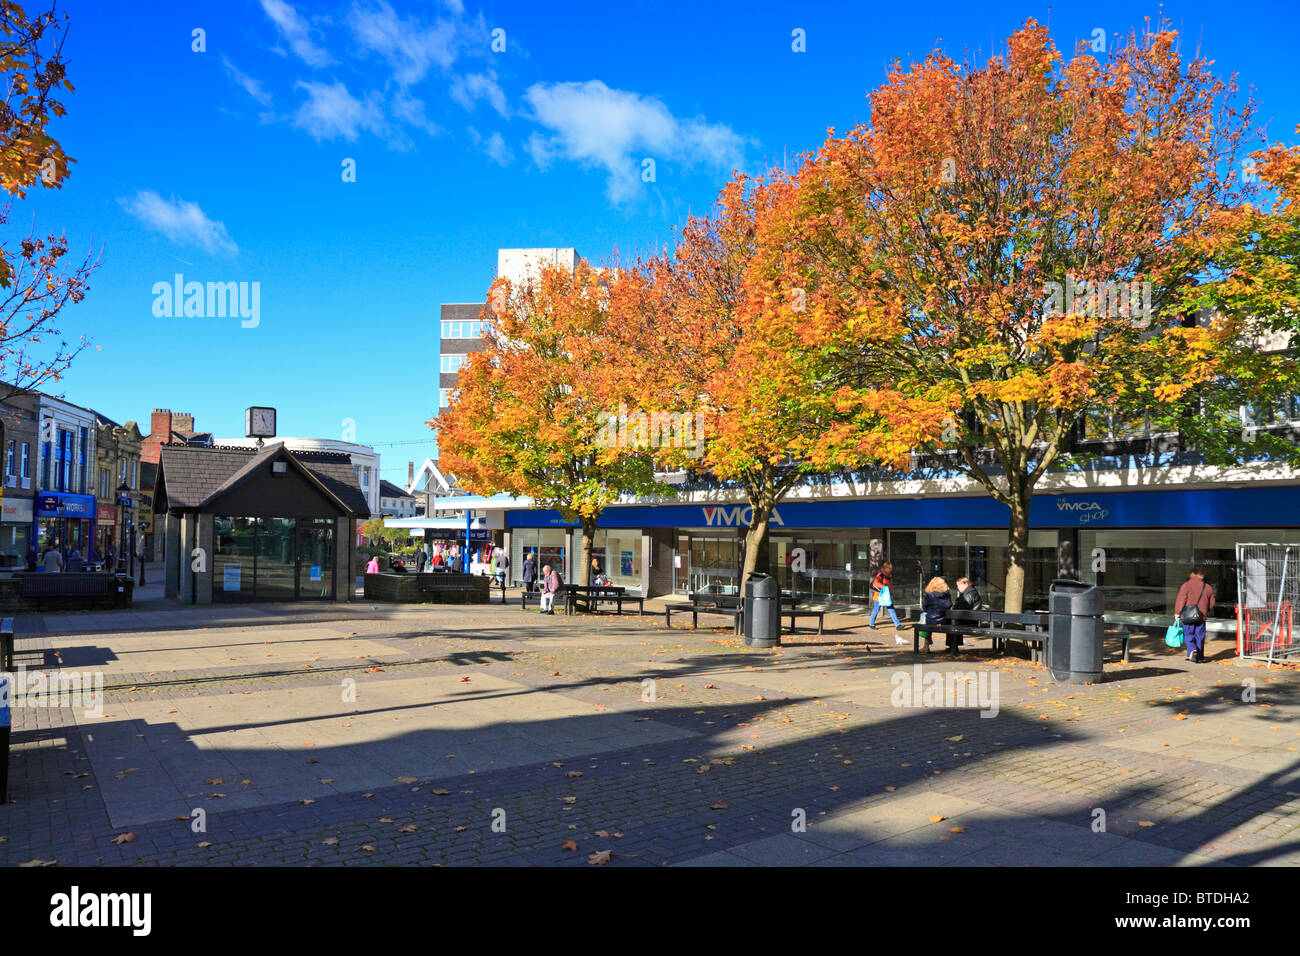 Autumn trees on a pedestrian precinct, Burnley, Lancashire, England, UK. - Stock Image